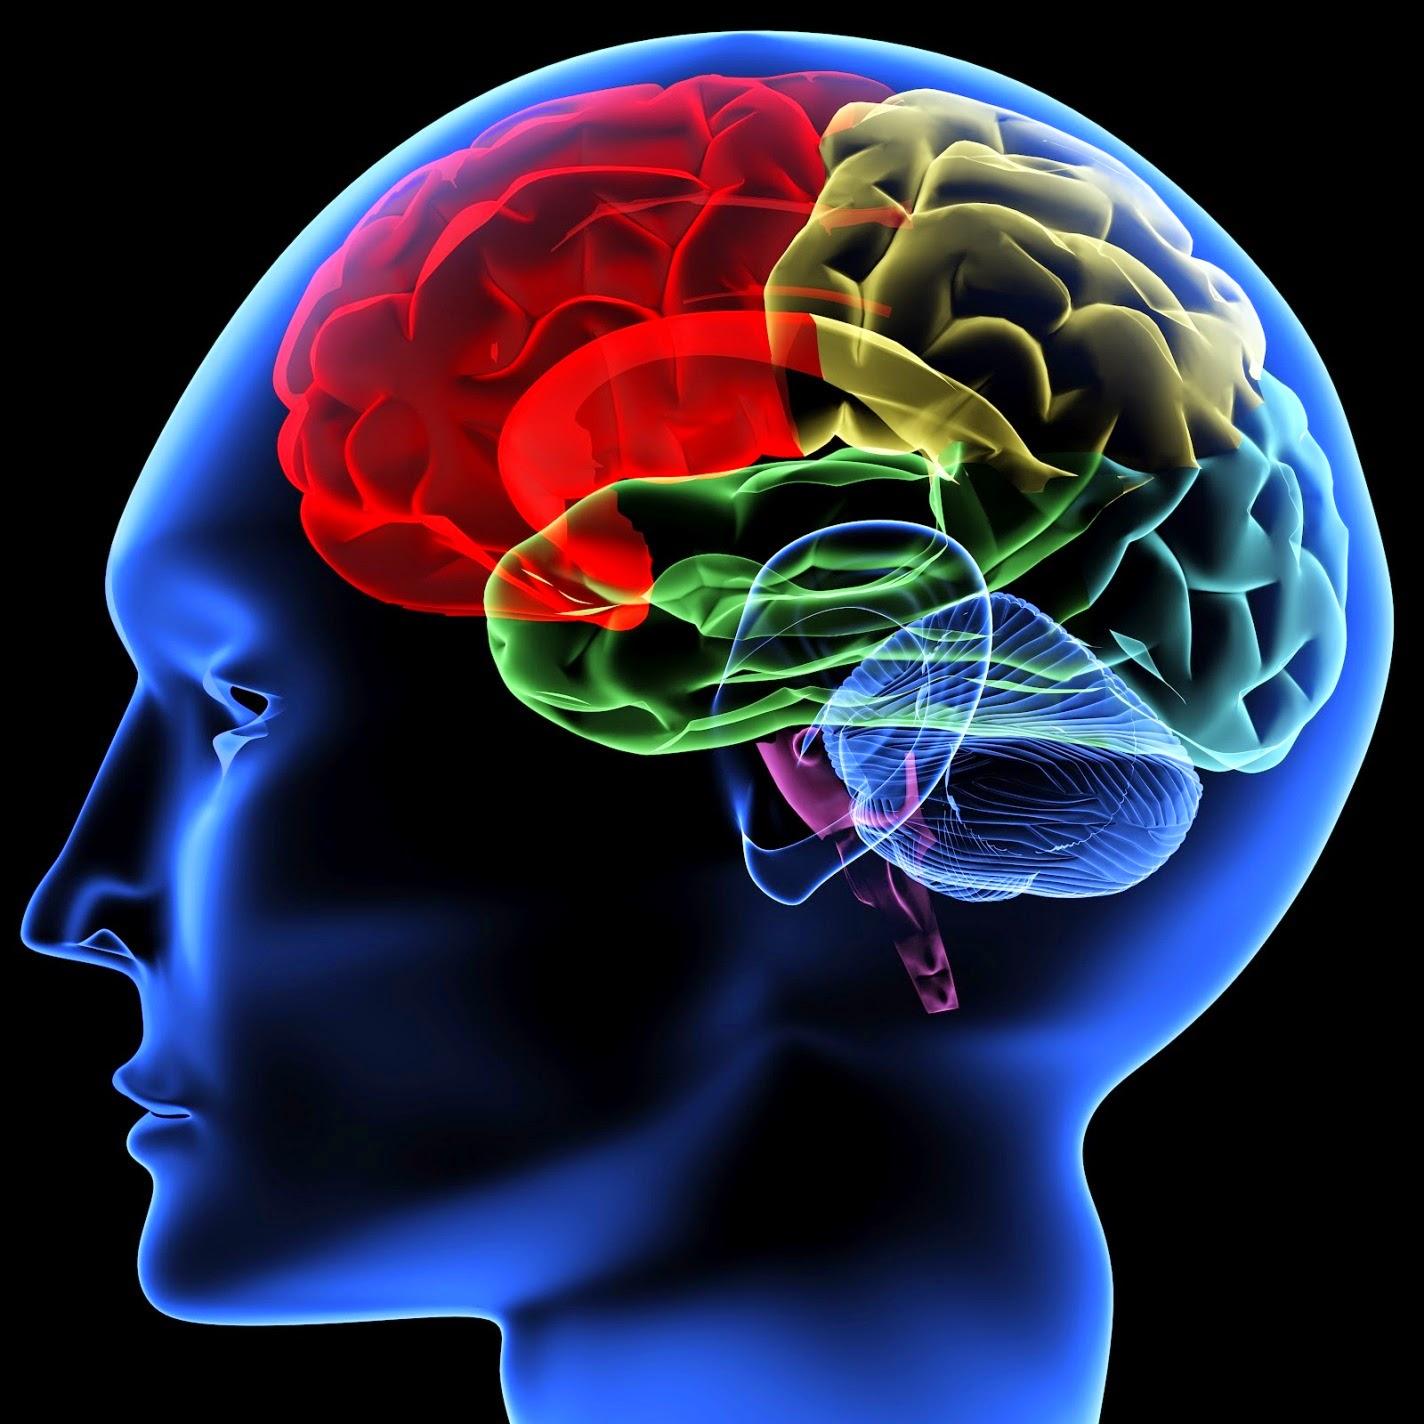 Otak manusia, periode keemasan